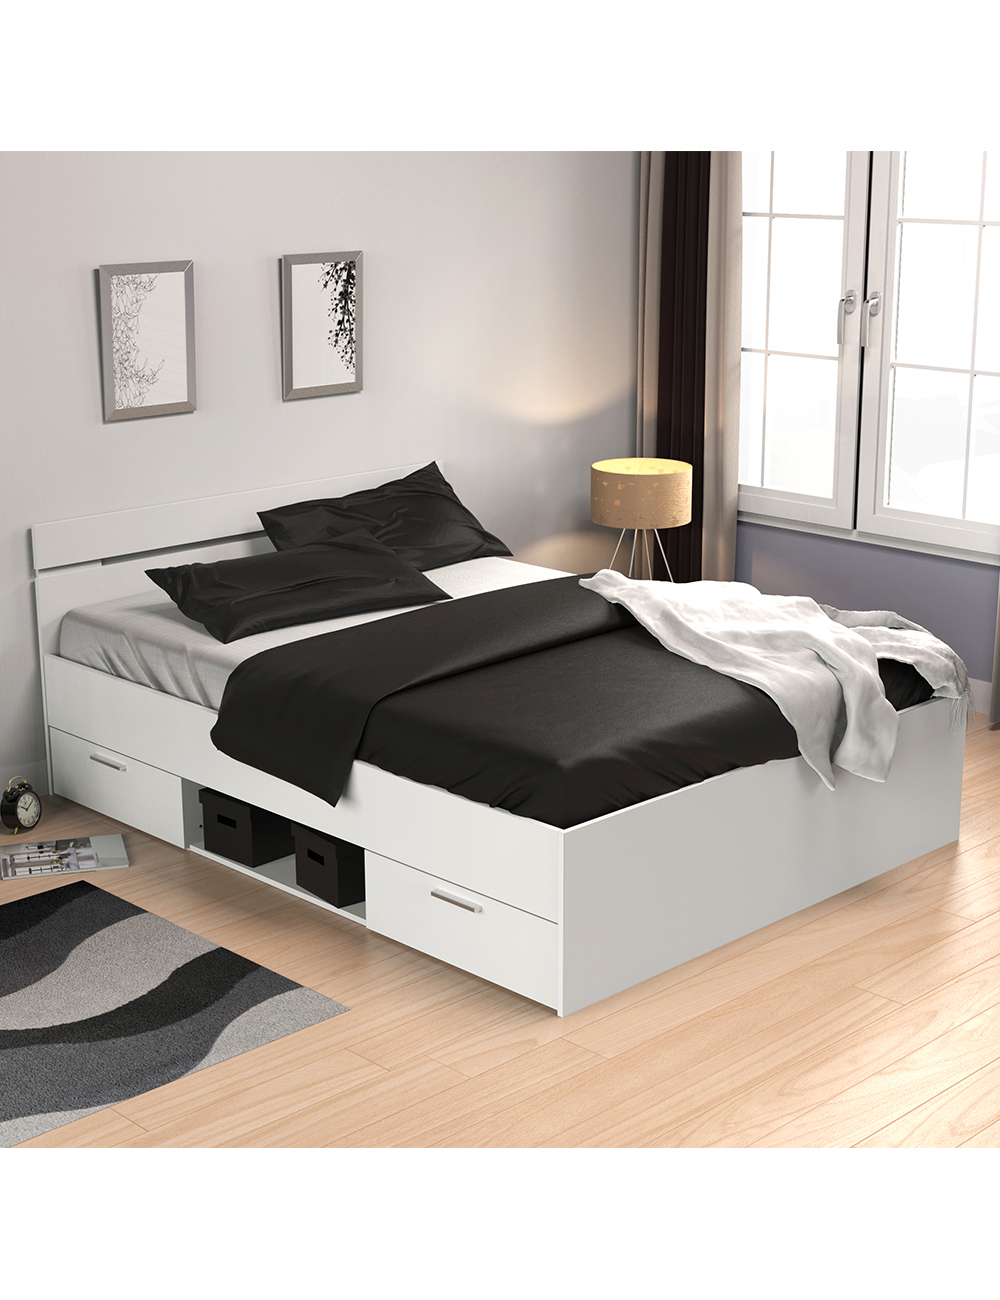 lit multifonction liberty 140 x 200 cm. Black Bedroom Furniture Sets. Home Design Ideas